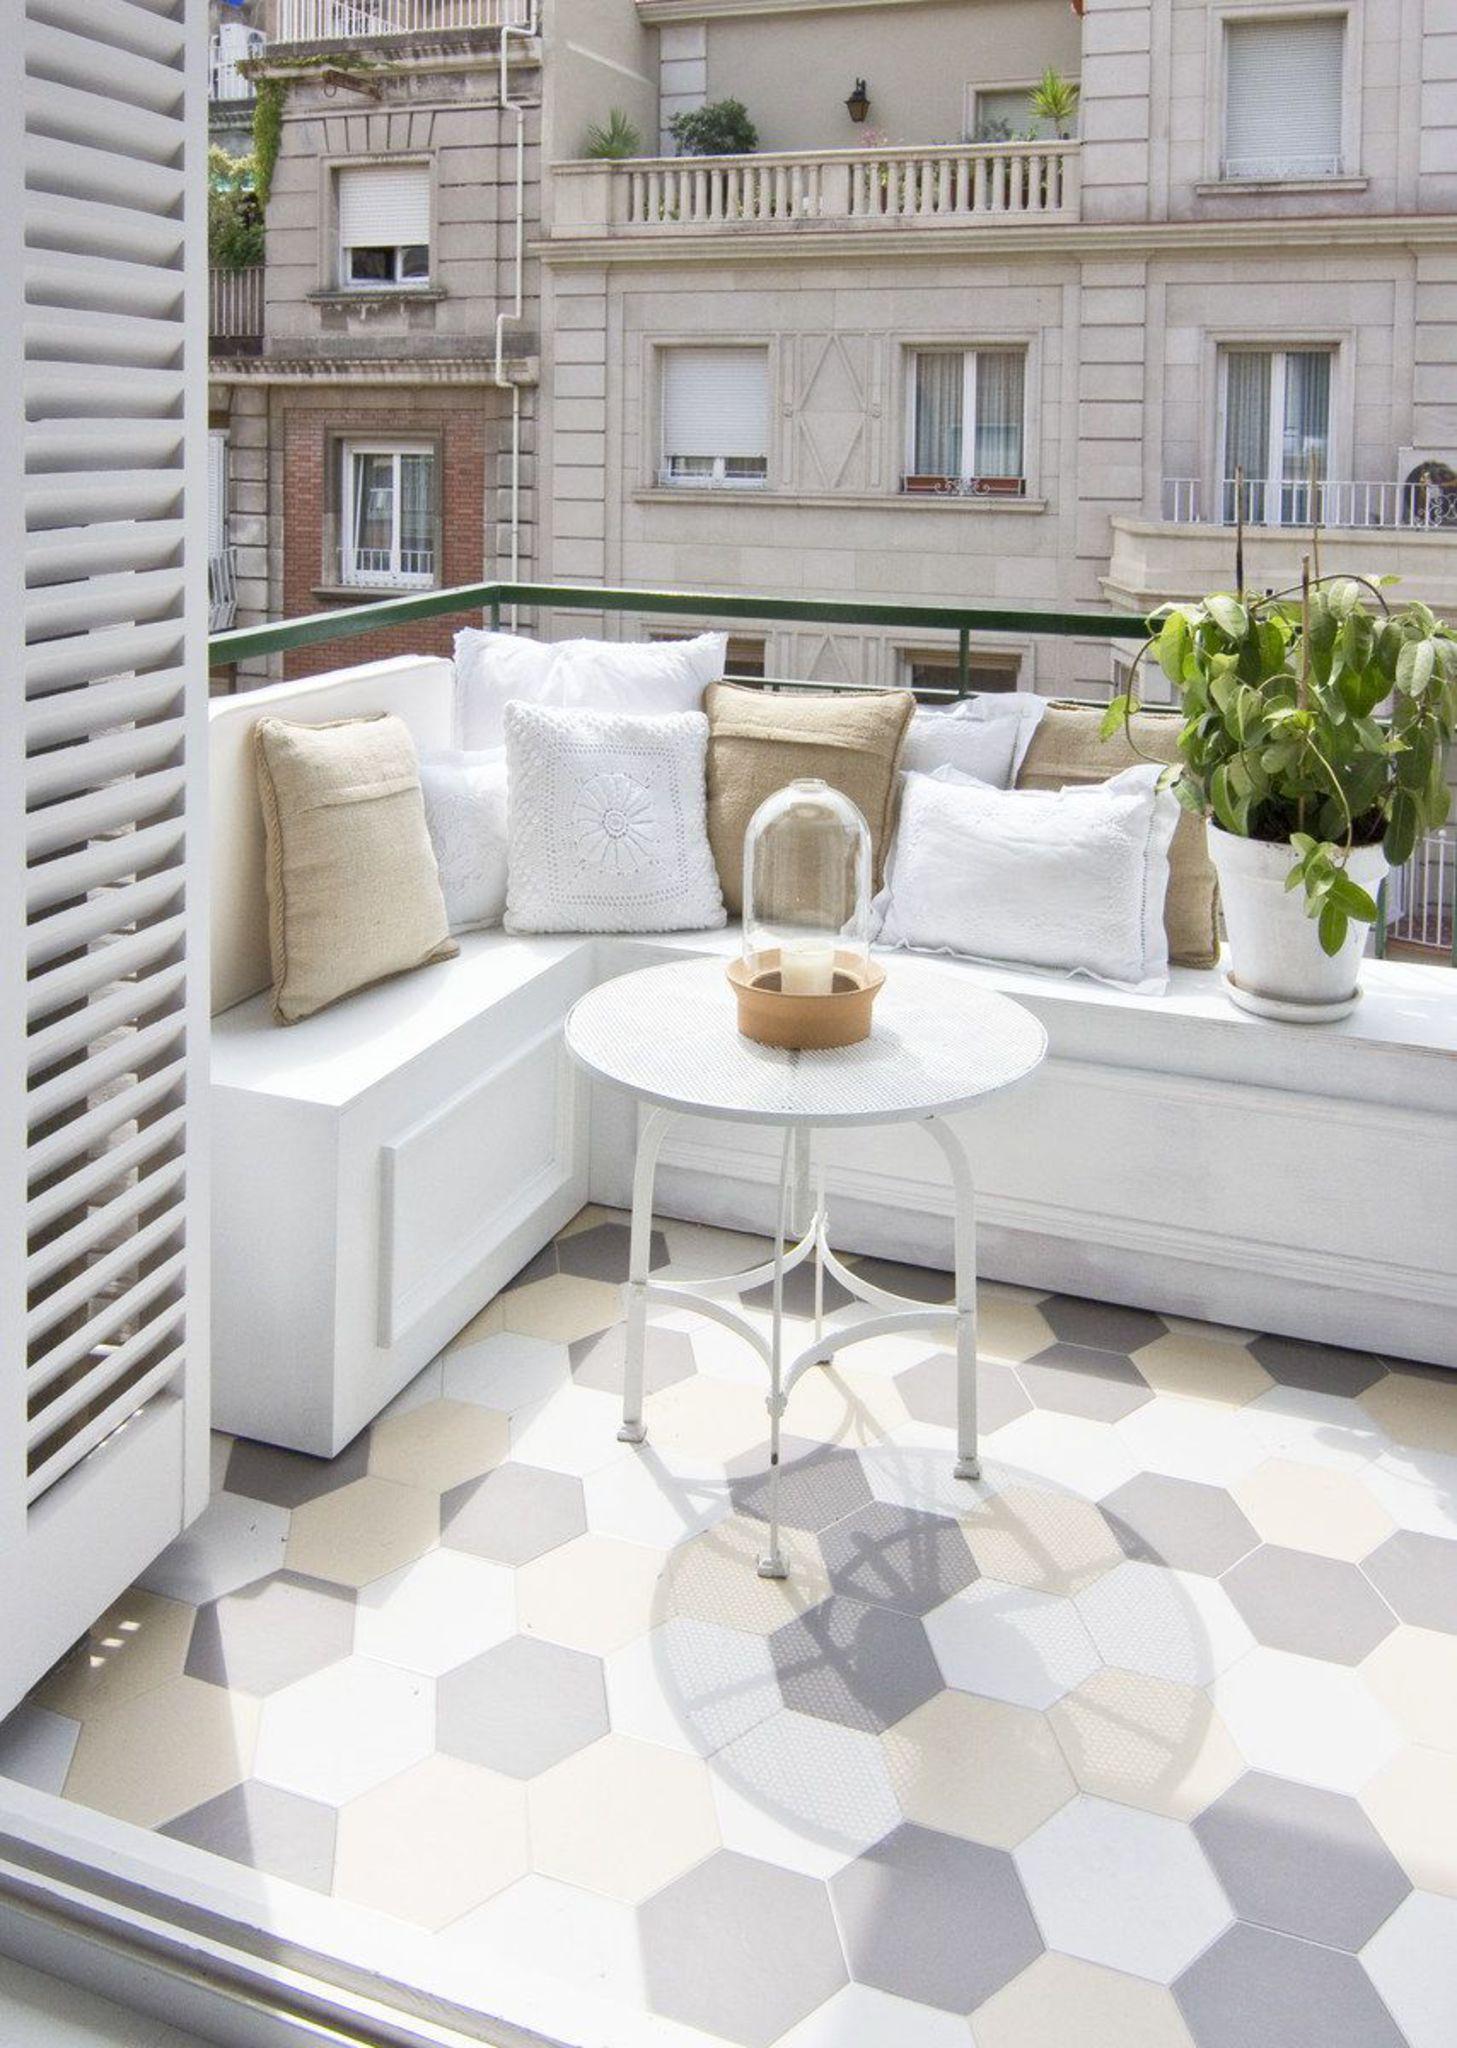 Petite Terrasse 15 Id Es Pour Lam Nager Terrace Ideasbalcony